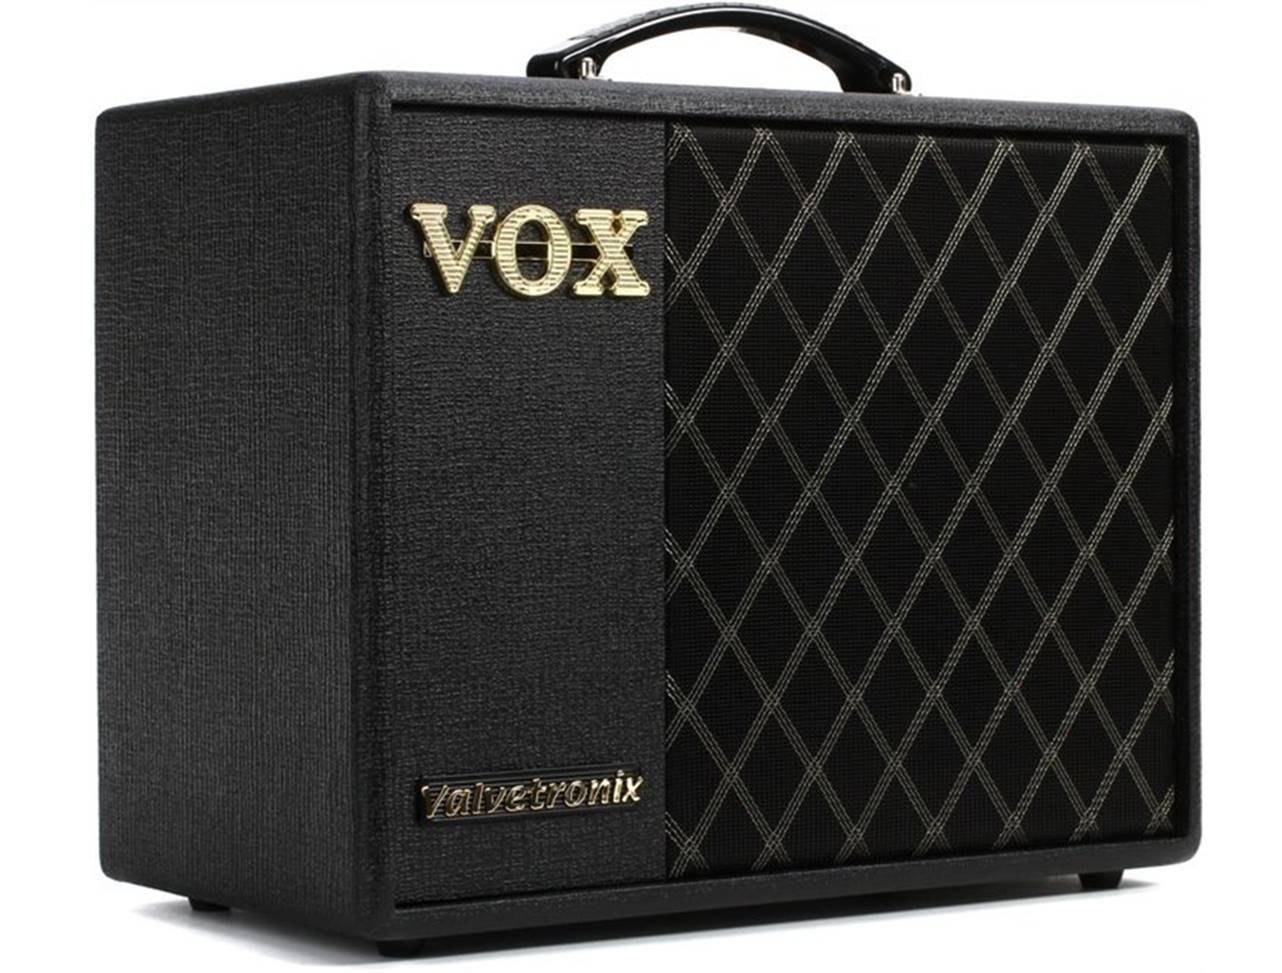 VOX Valvetronix VT20 Guitar Amp